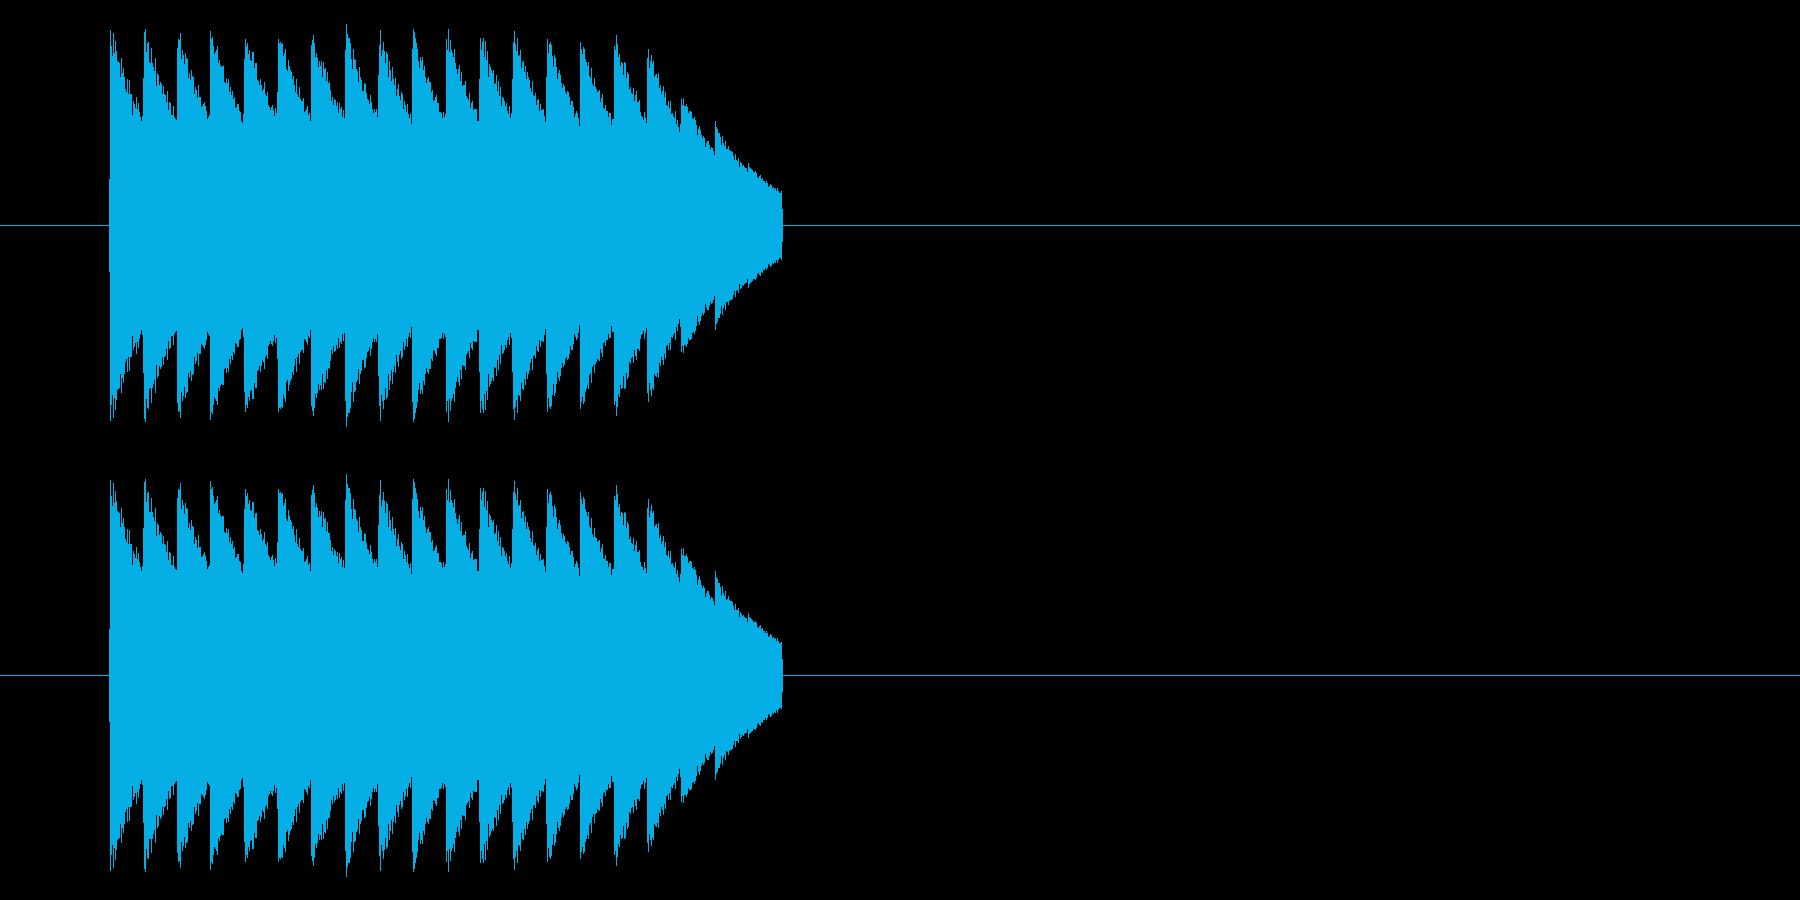 NES アクション01-12(アイテム)の再生済みの波形